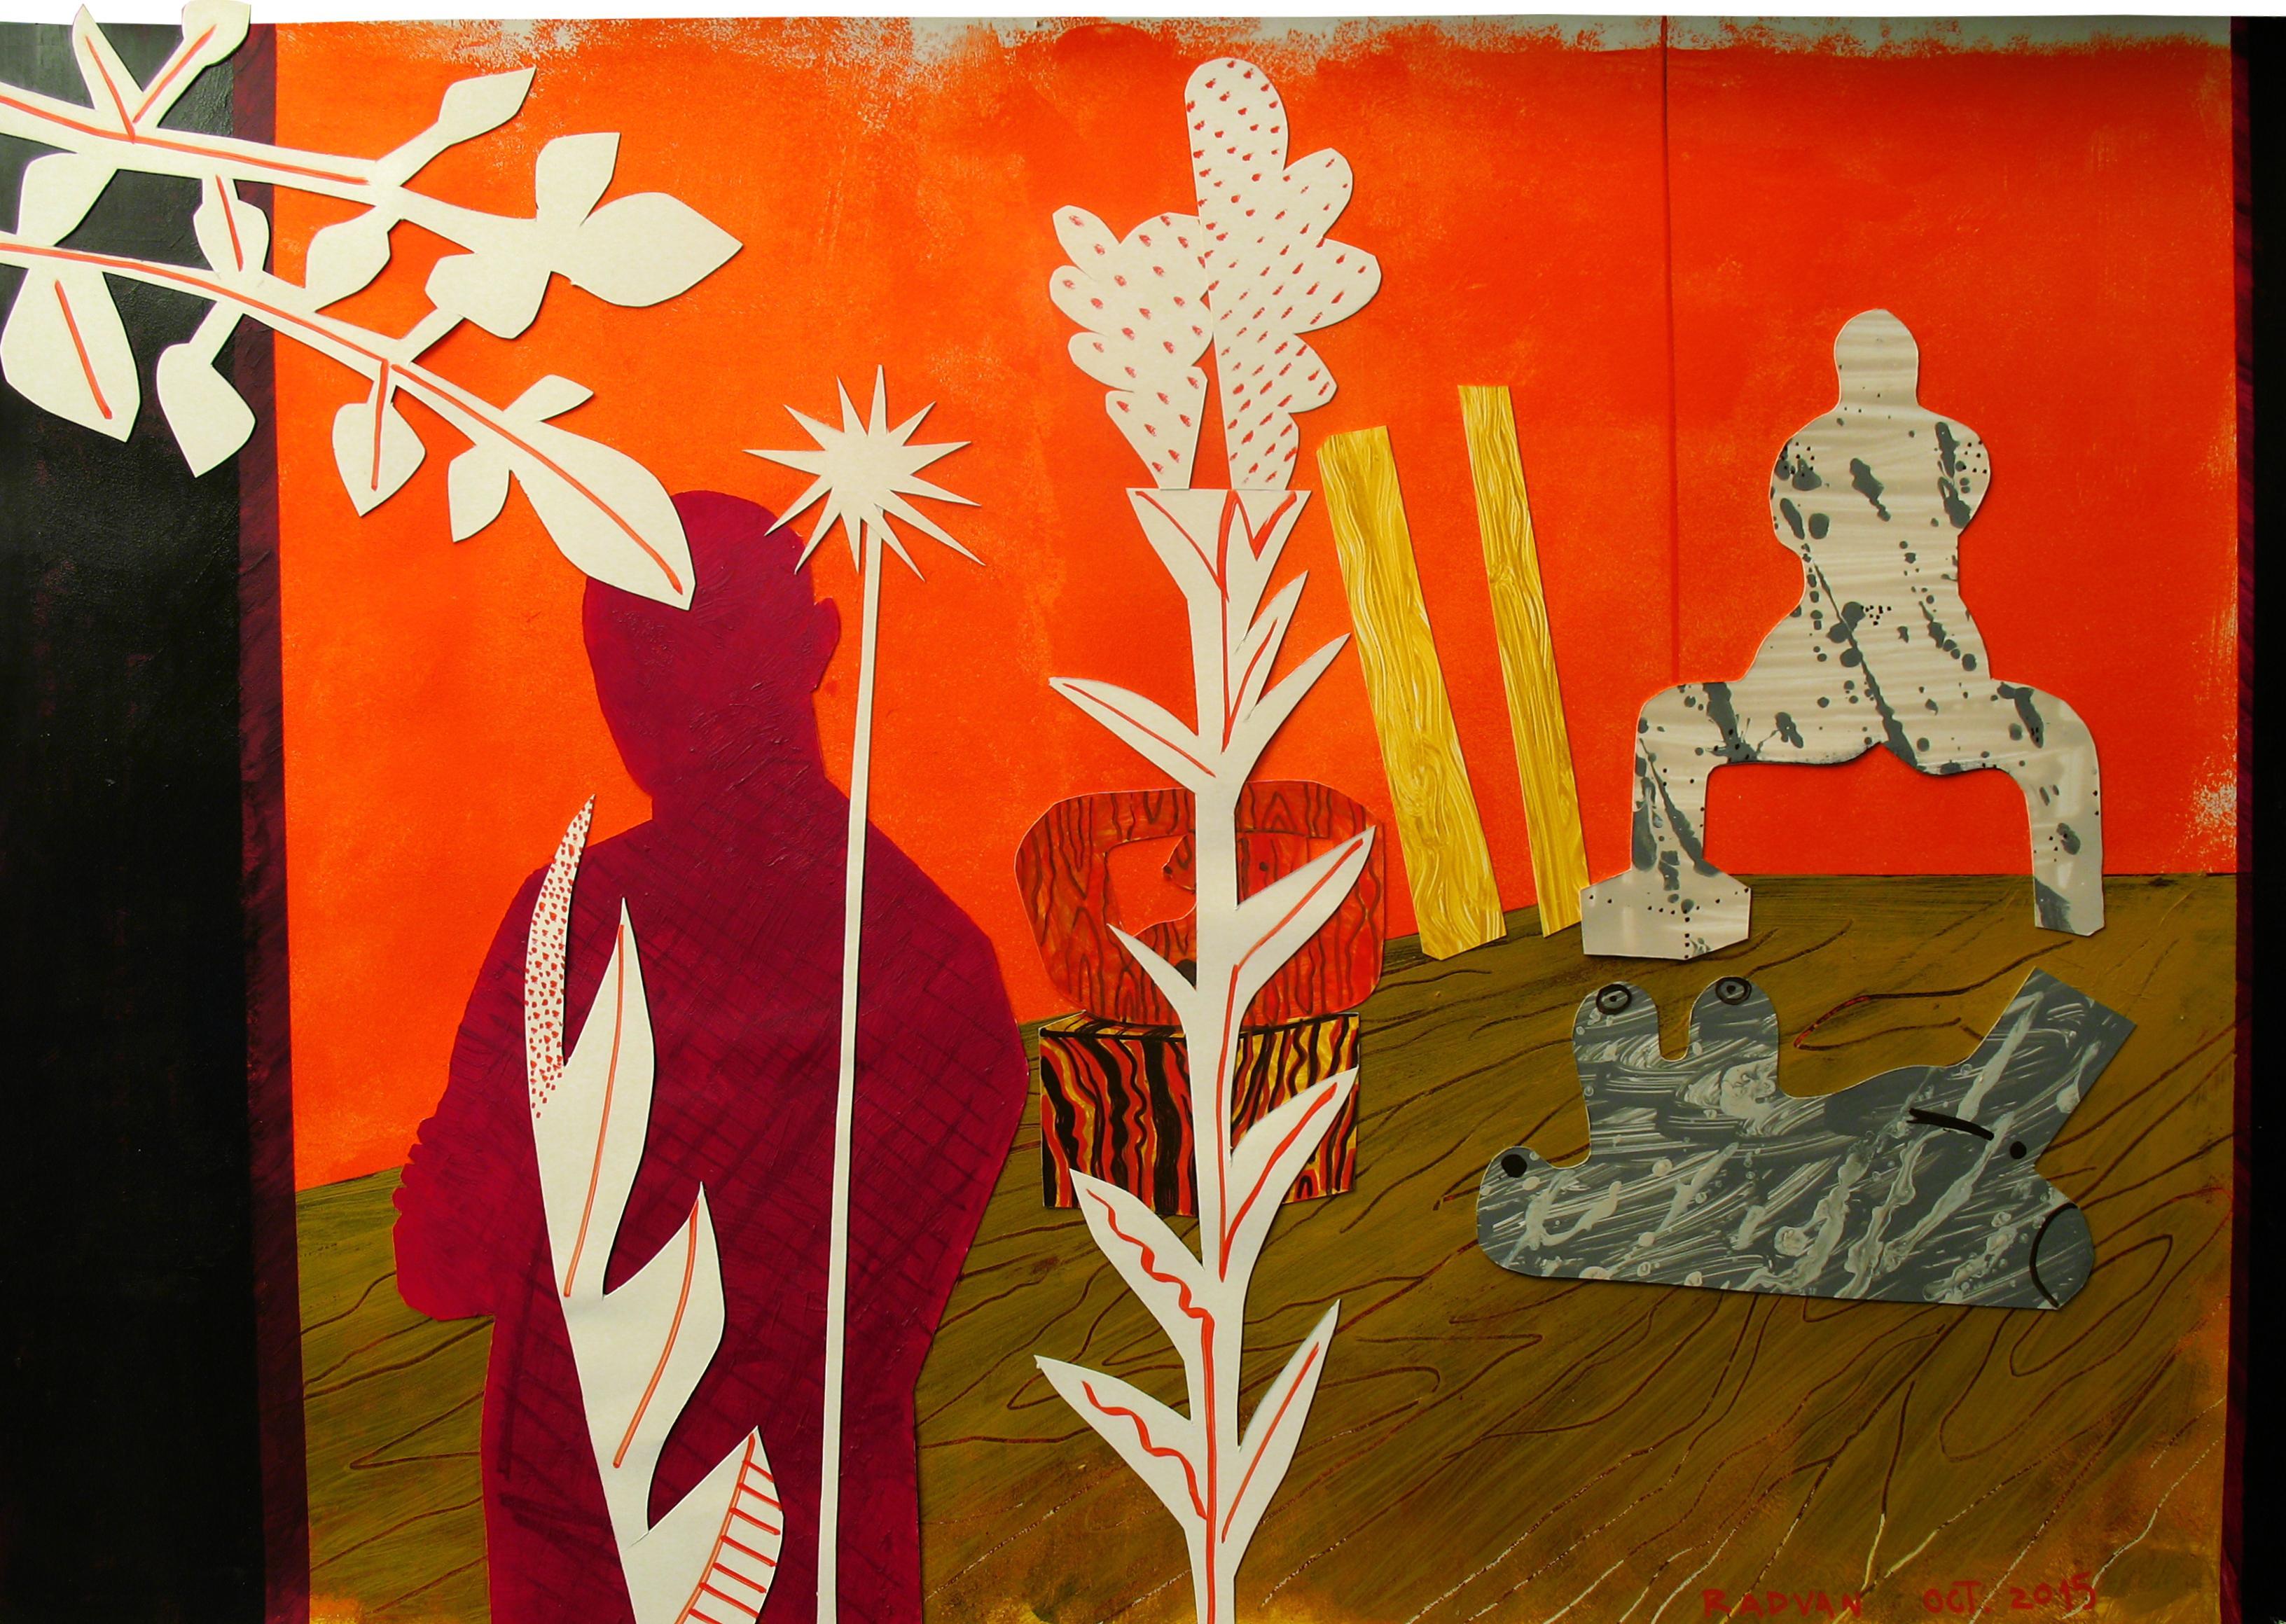 Pygmalion - Sculptor Studio II - 21st Century, Female, Couple, Nude, Flowers